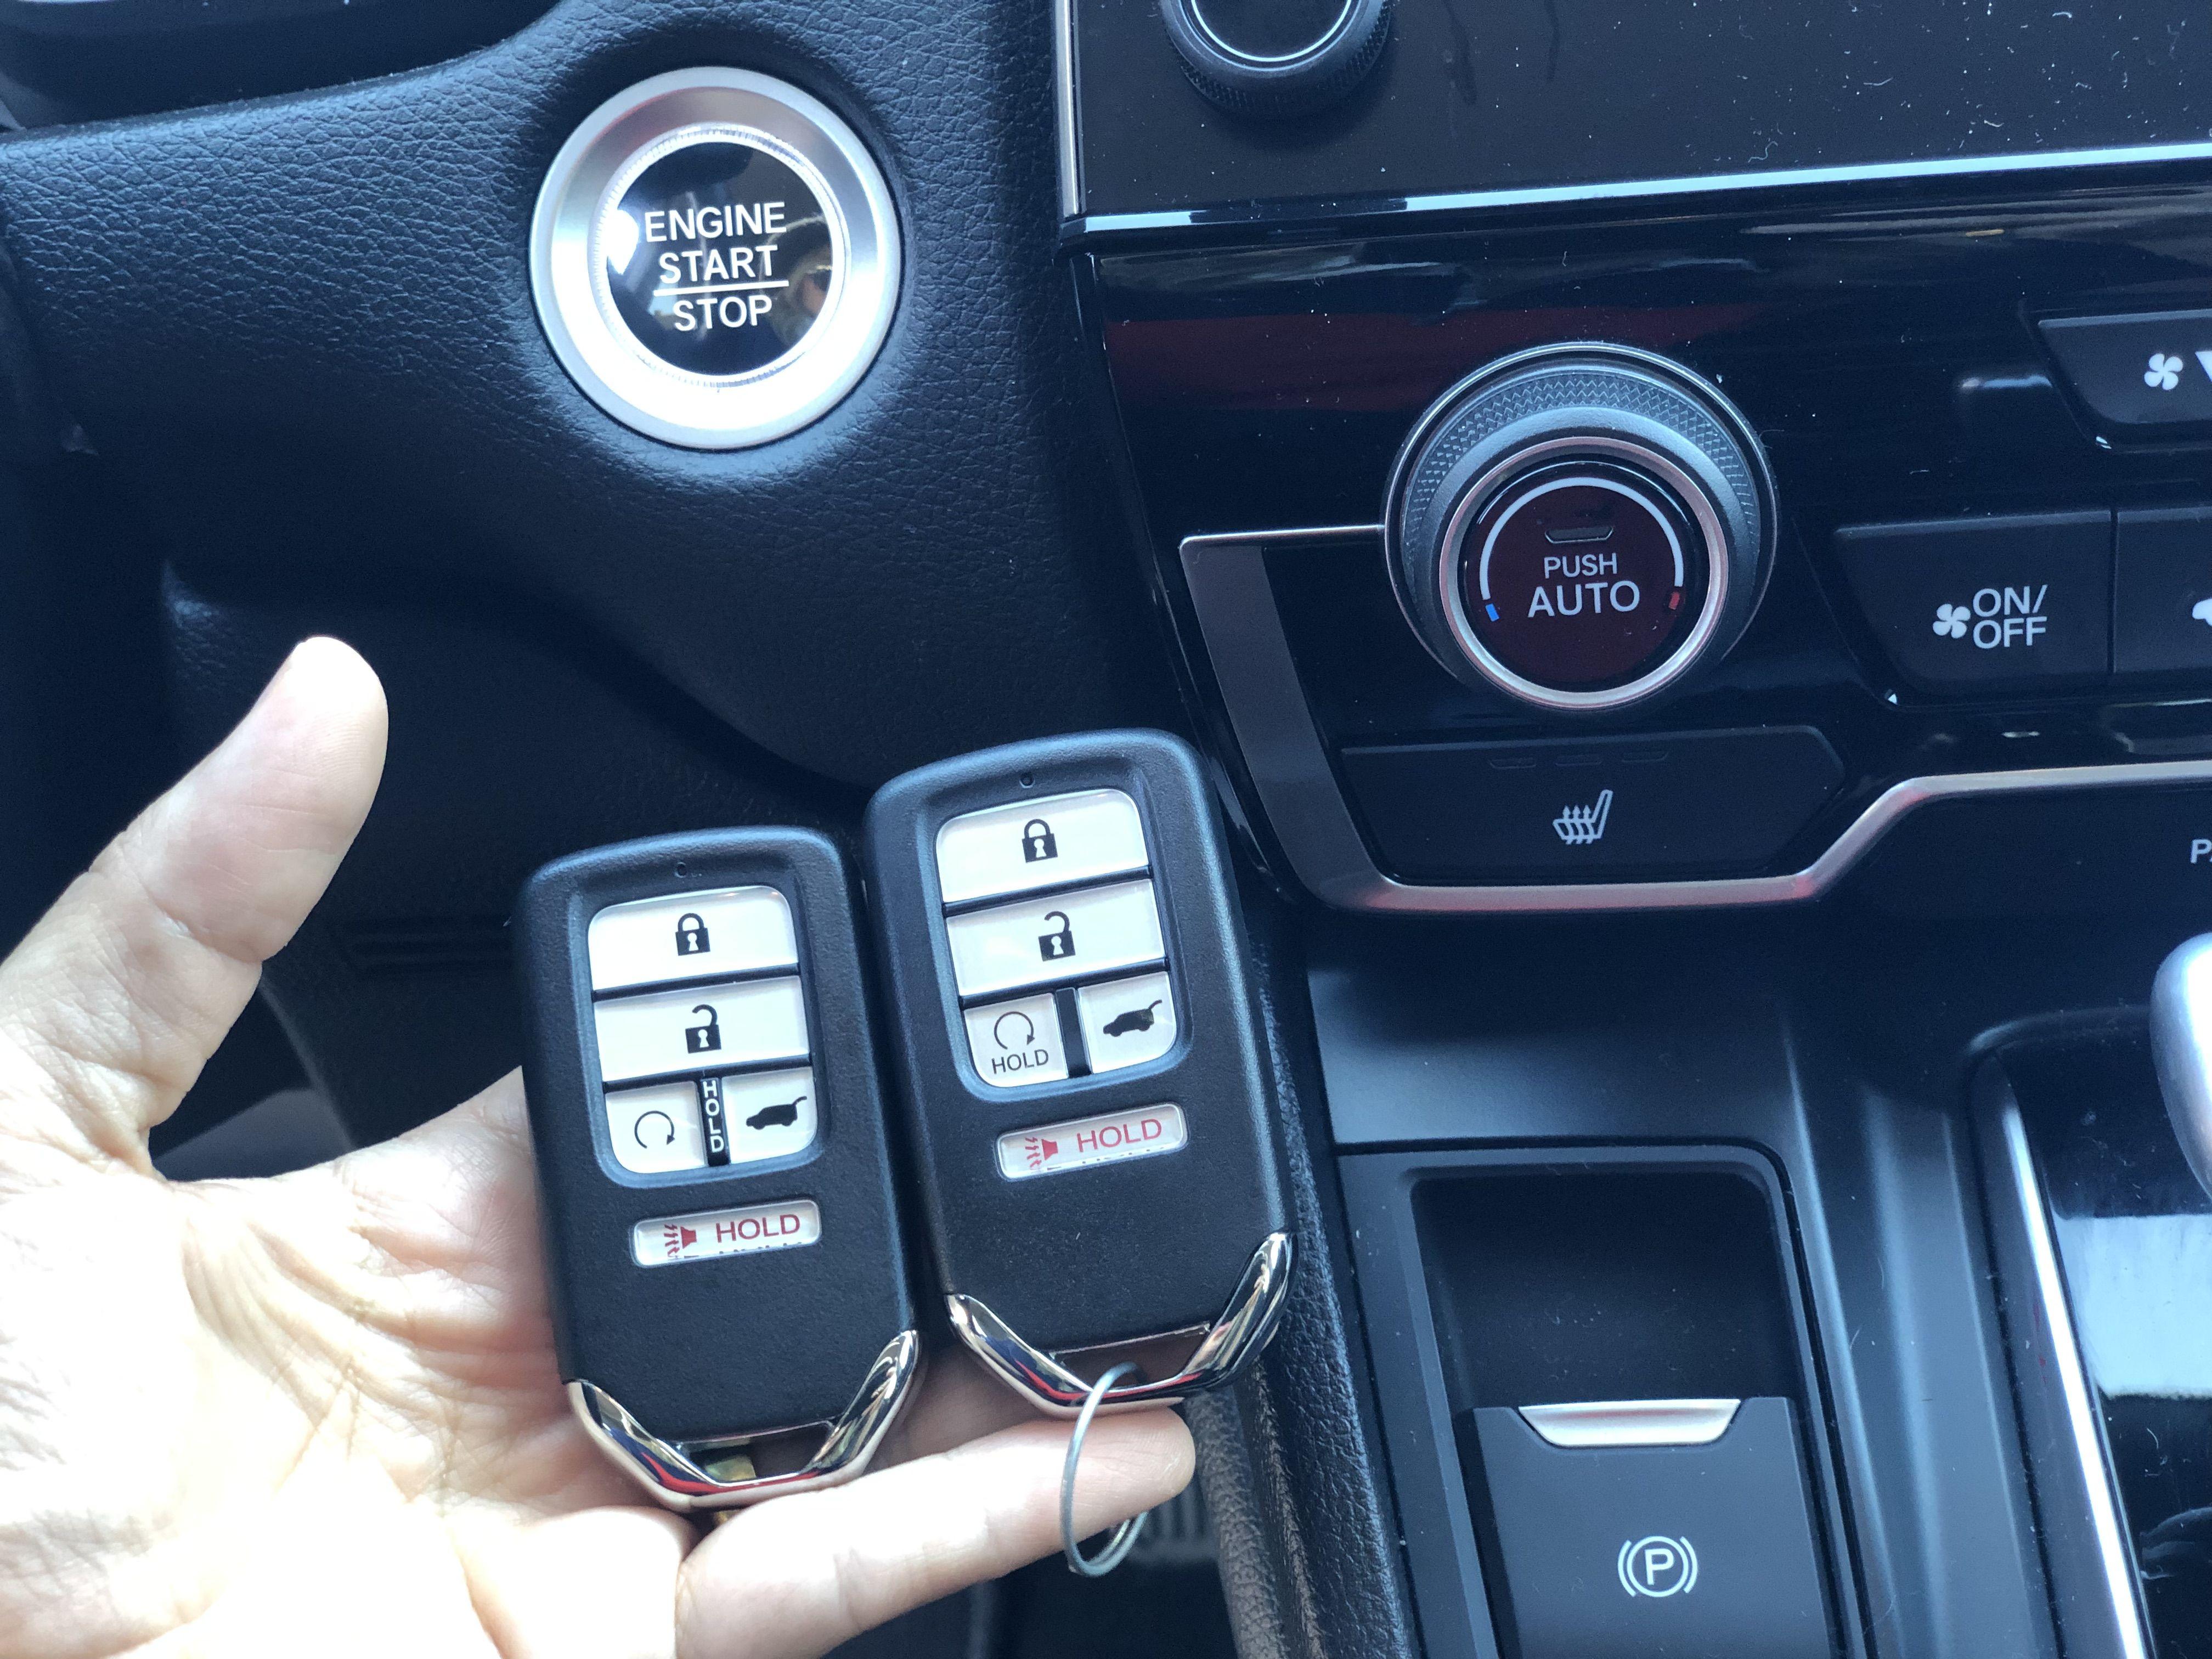 2019 honda crv 5button smart key duplication car